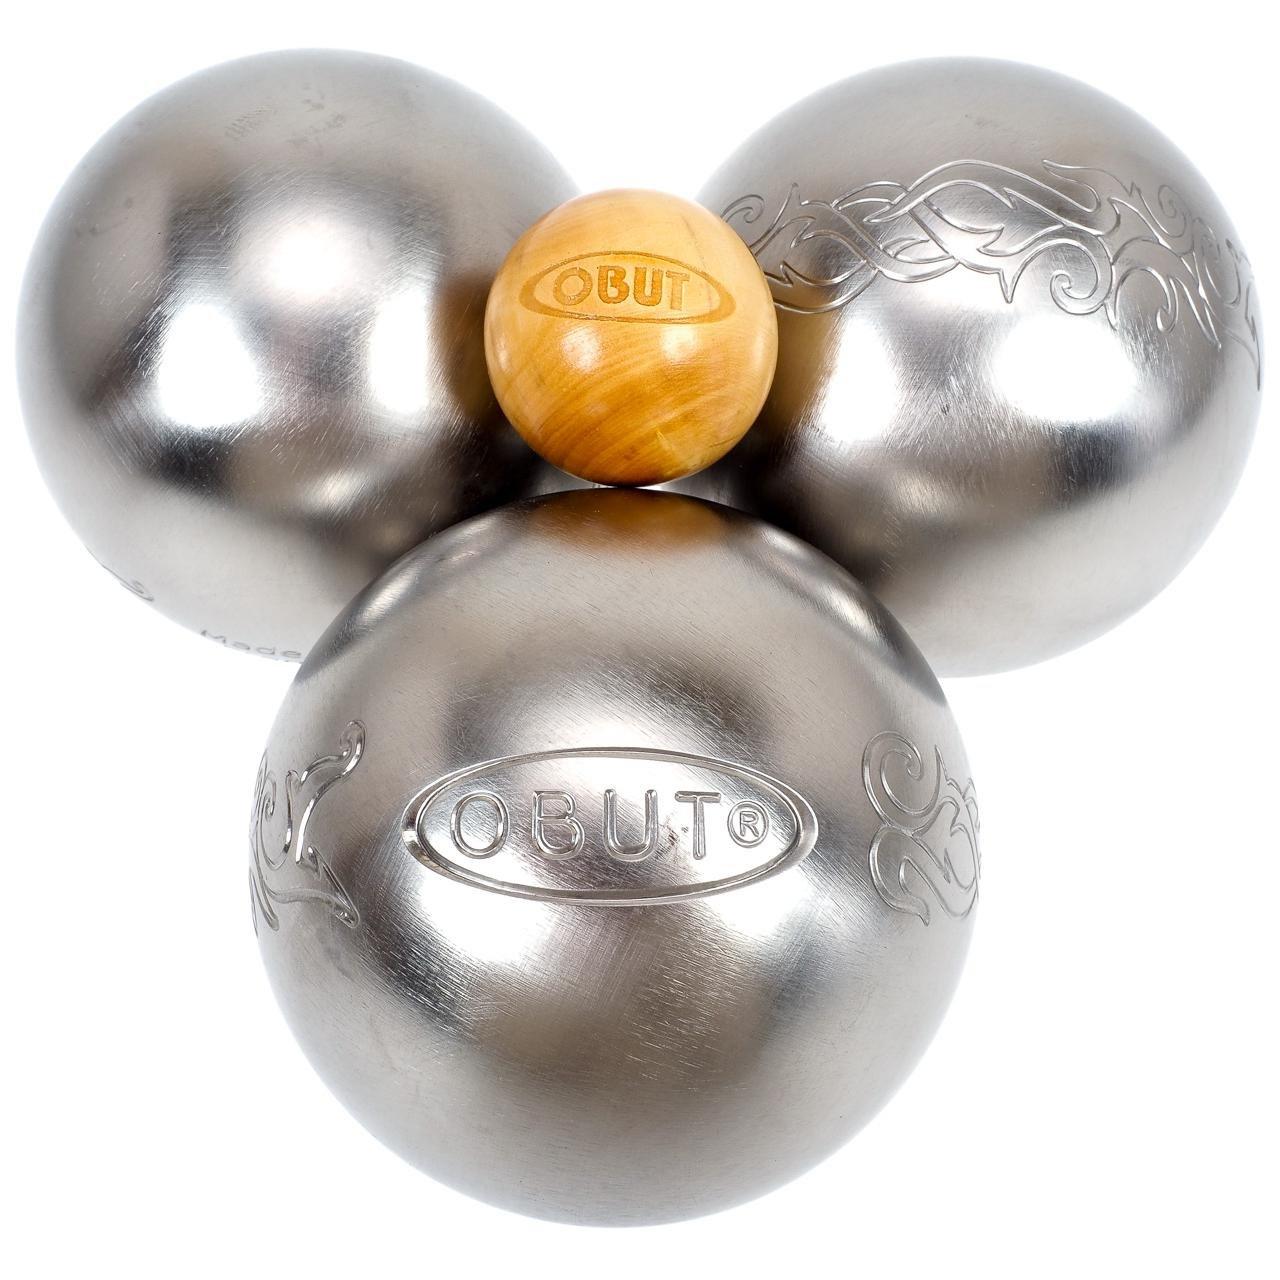 Obut Loisir inox TATOU, jeu de 3 boules product image